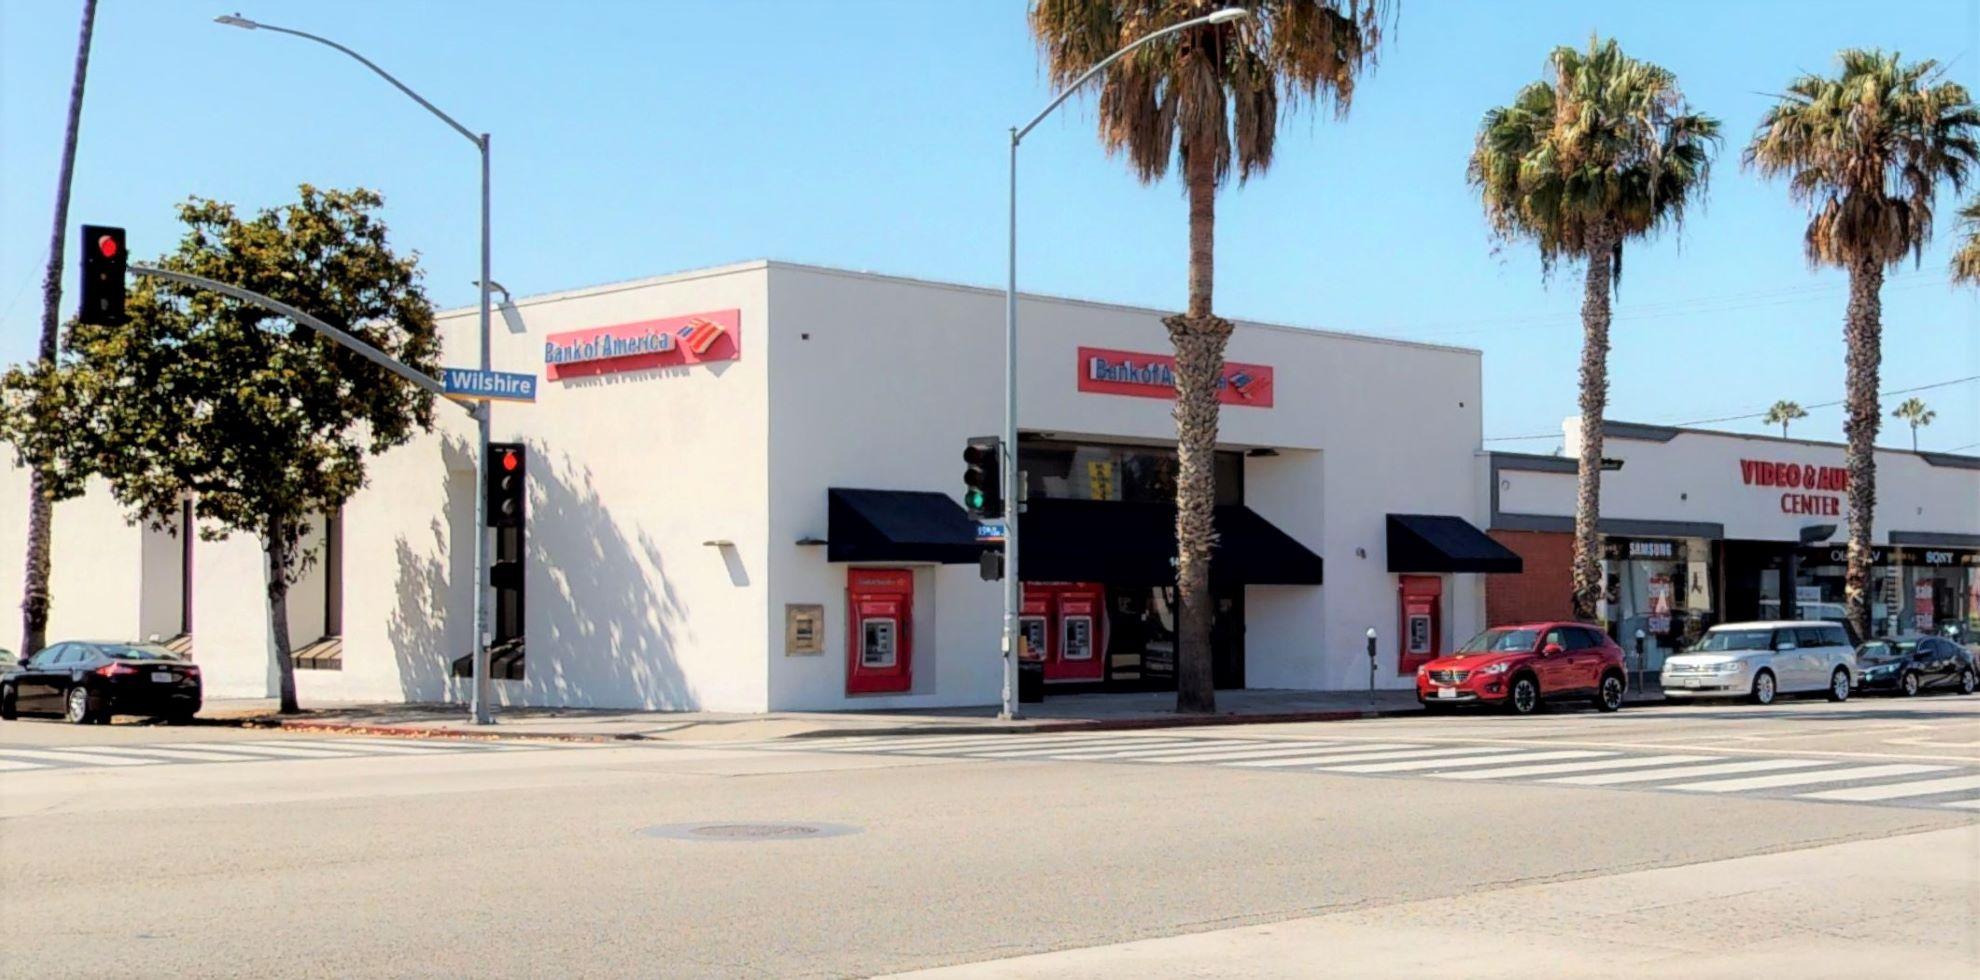 Bank of America financial center with walk-up ATM   1430 Wilshire Blvd, Santa Monica, CA 90403